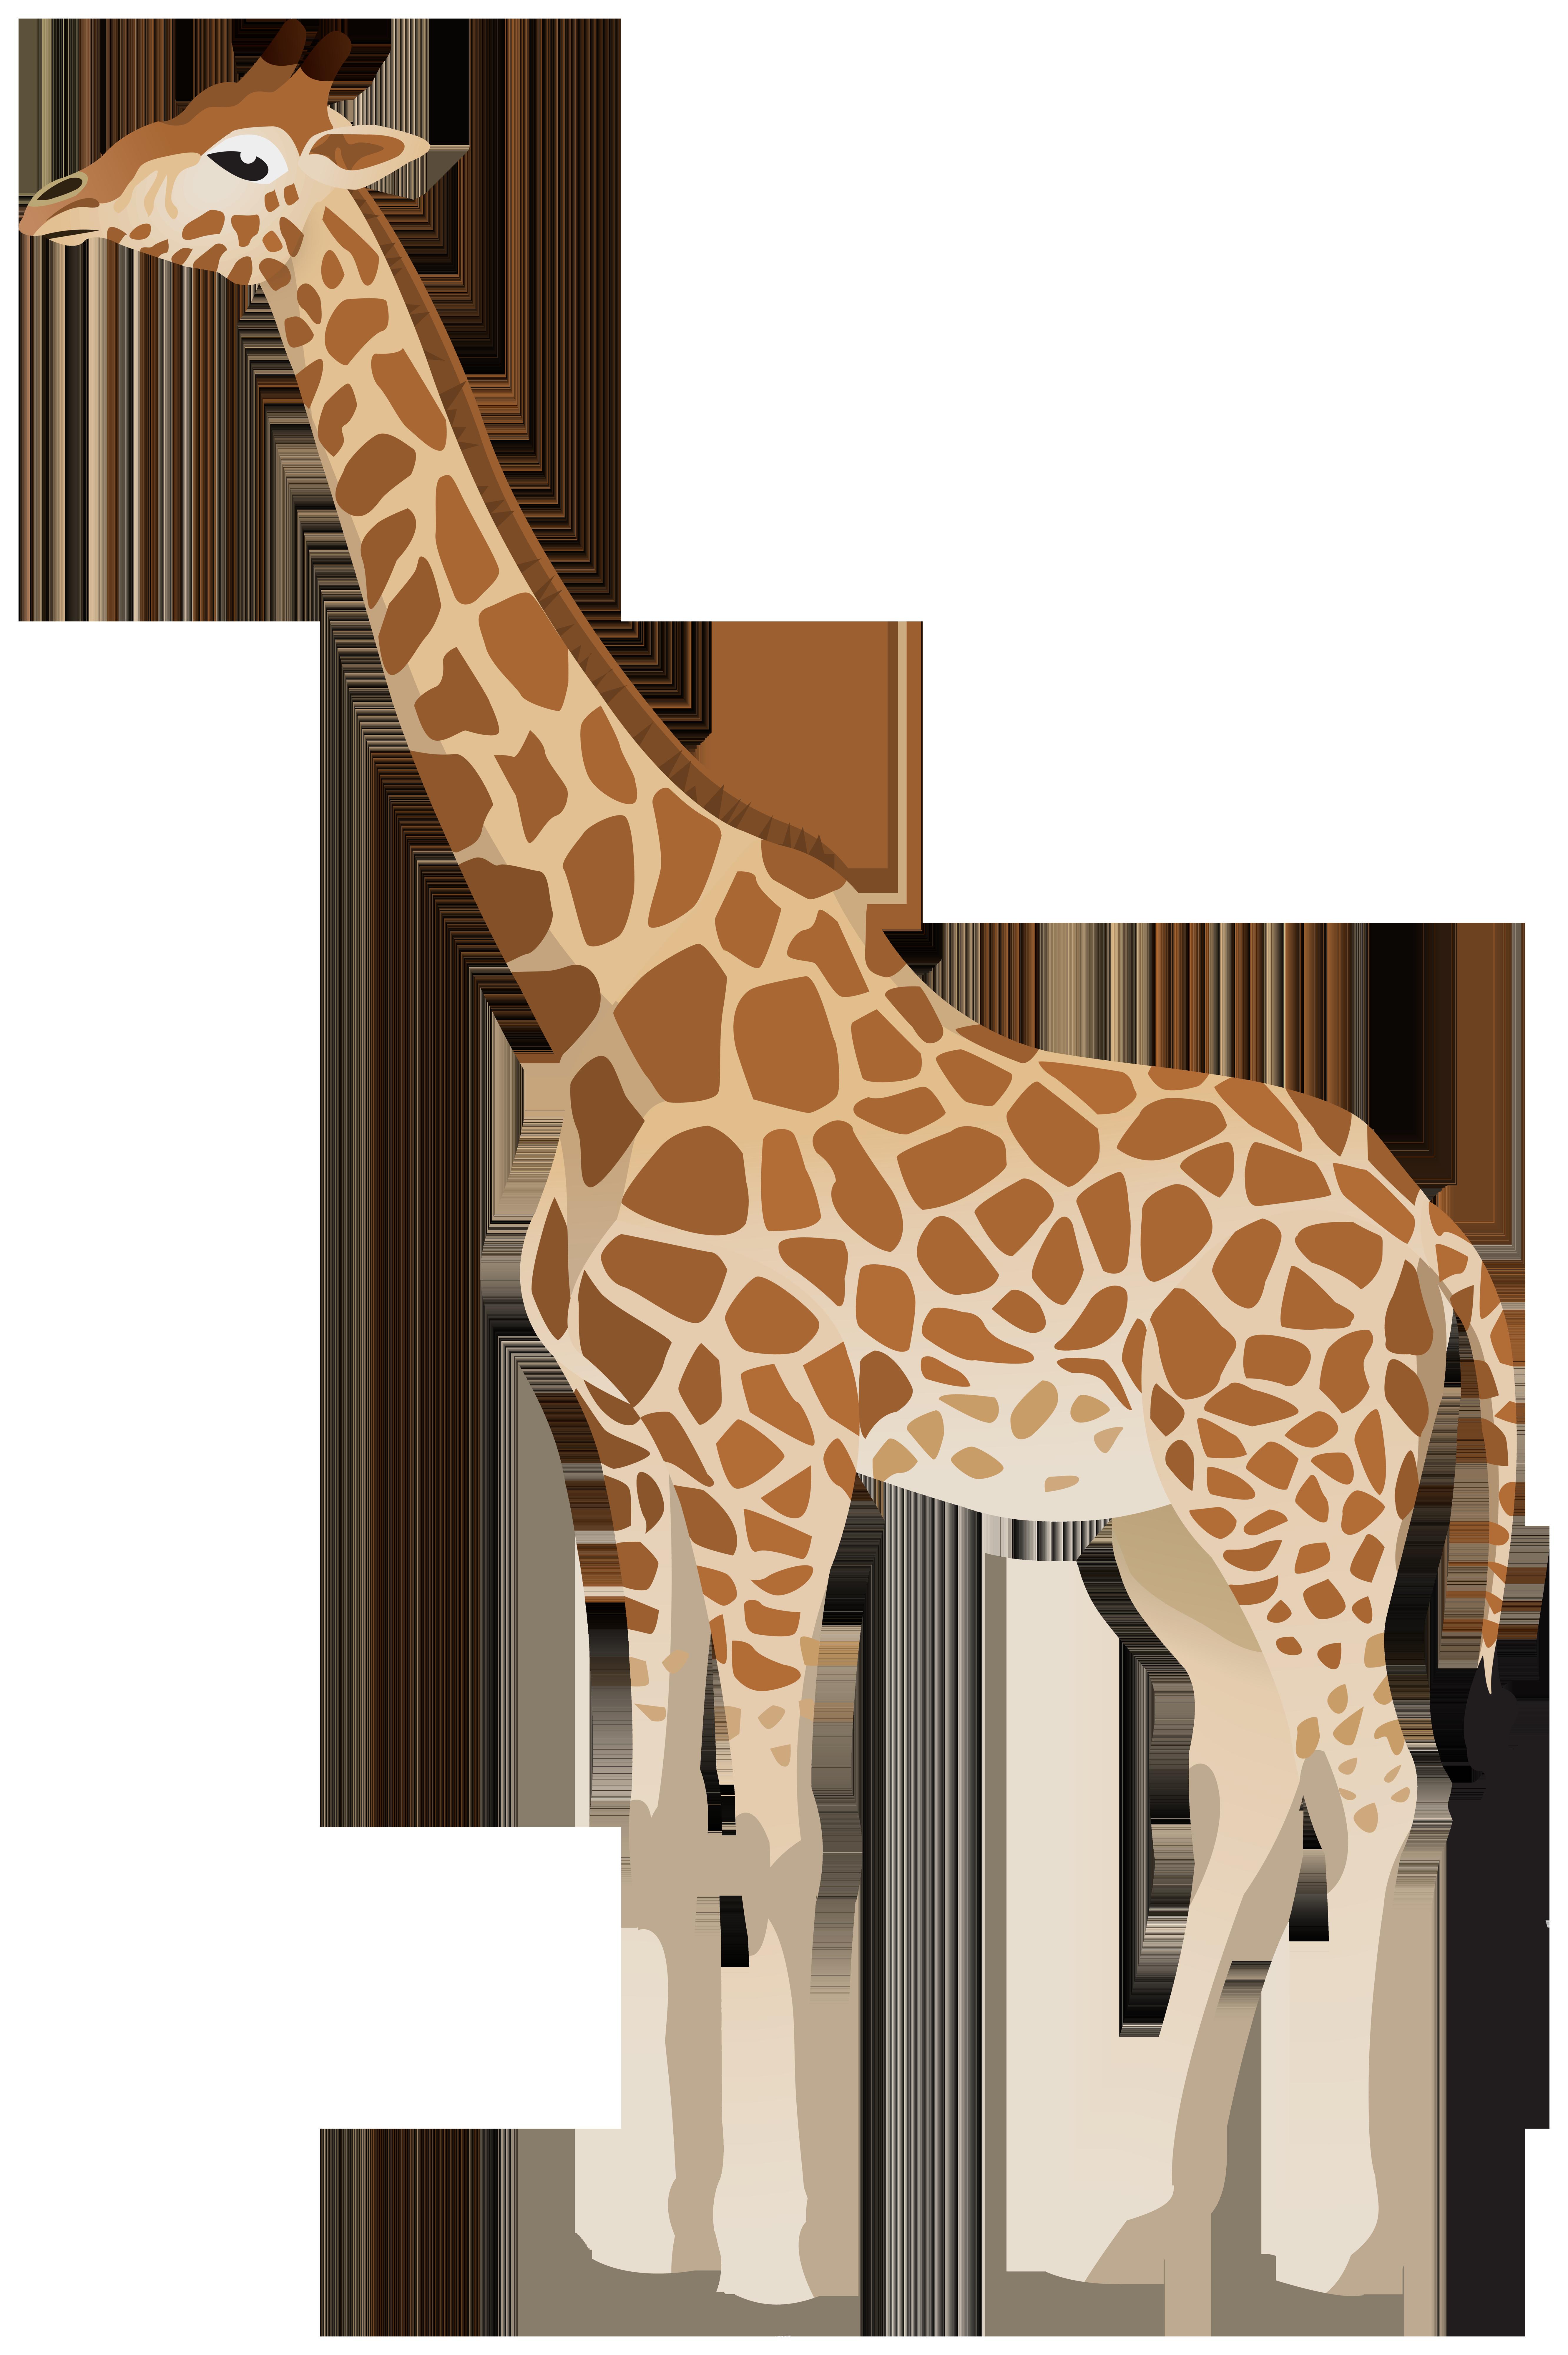 Giraffe image clipart jpg free stock Giraffe Clipart Image | Gallery Yopriceville - High-Quality Images ... jpg free stock